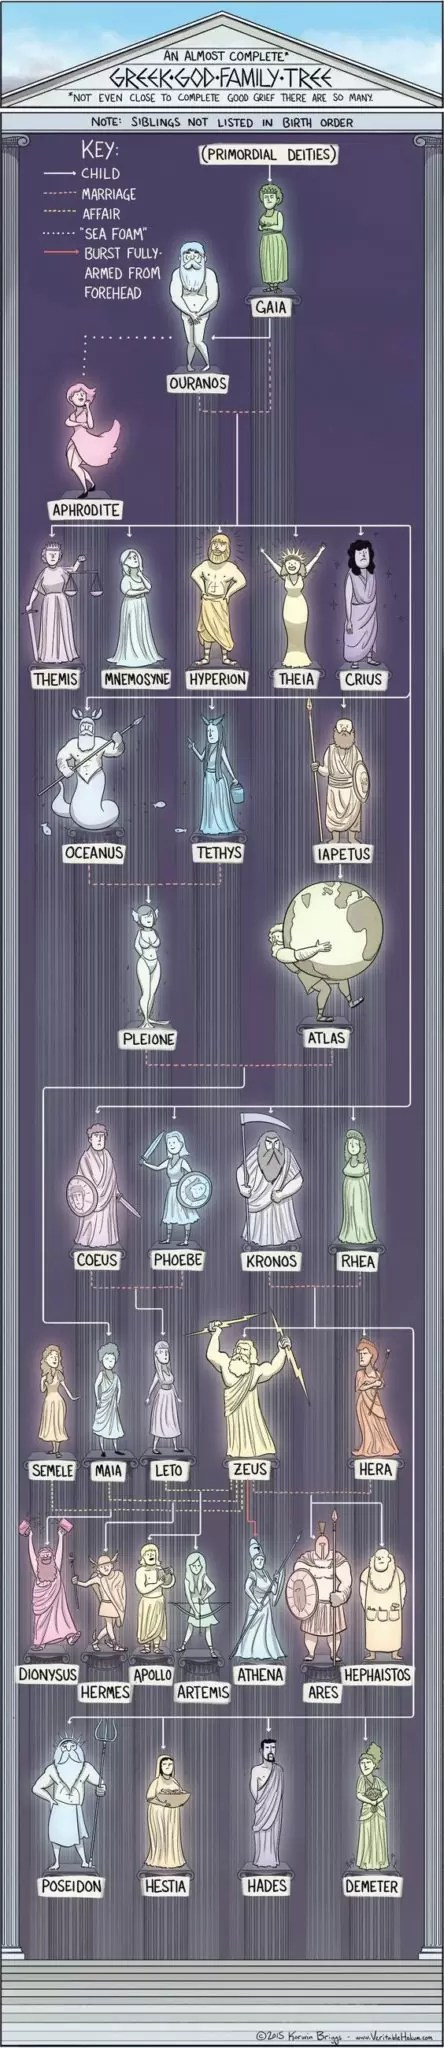 arvore - Árvore genealógica da Mitologia grega